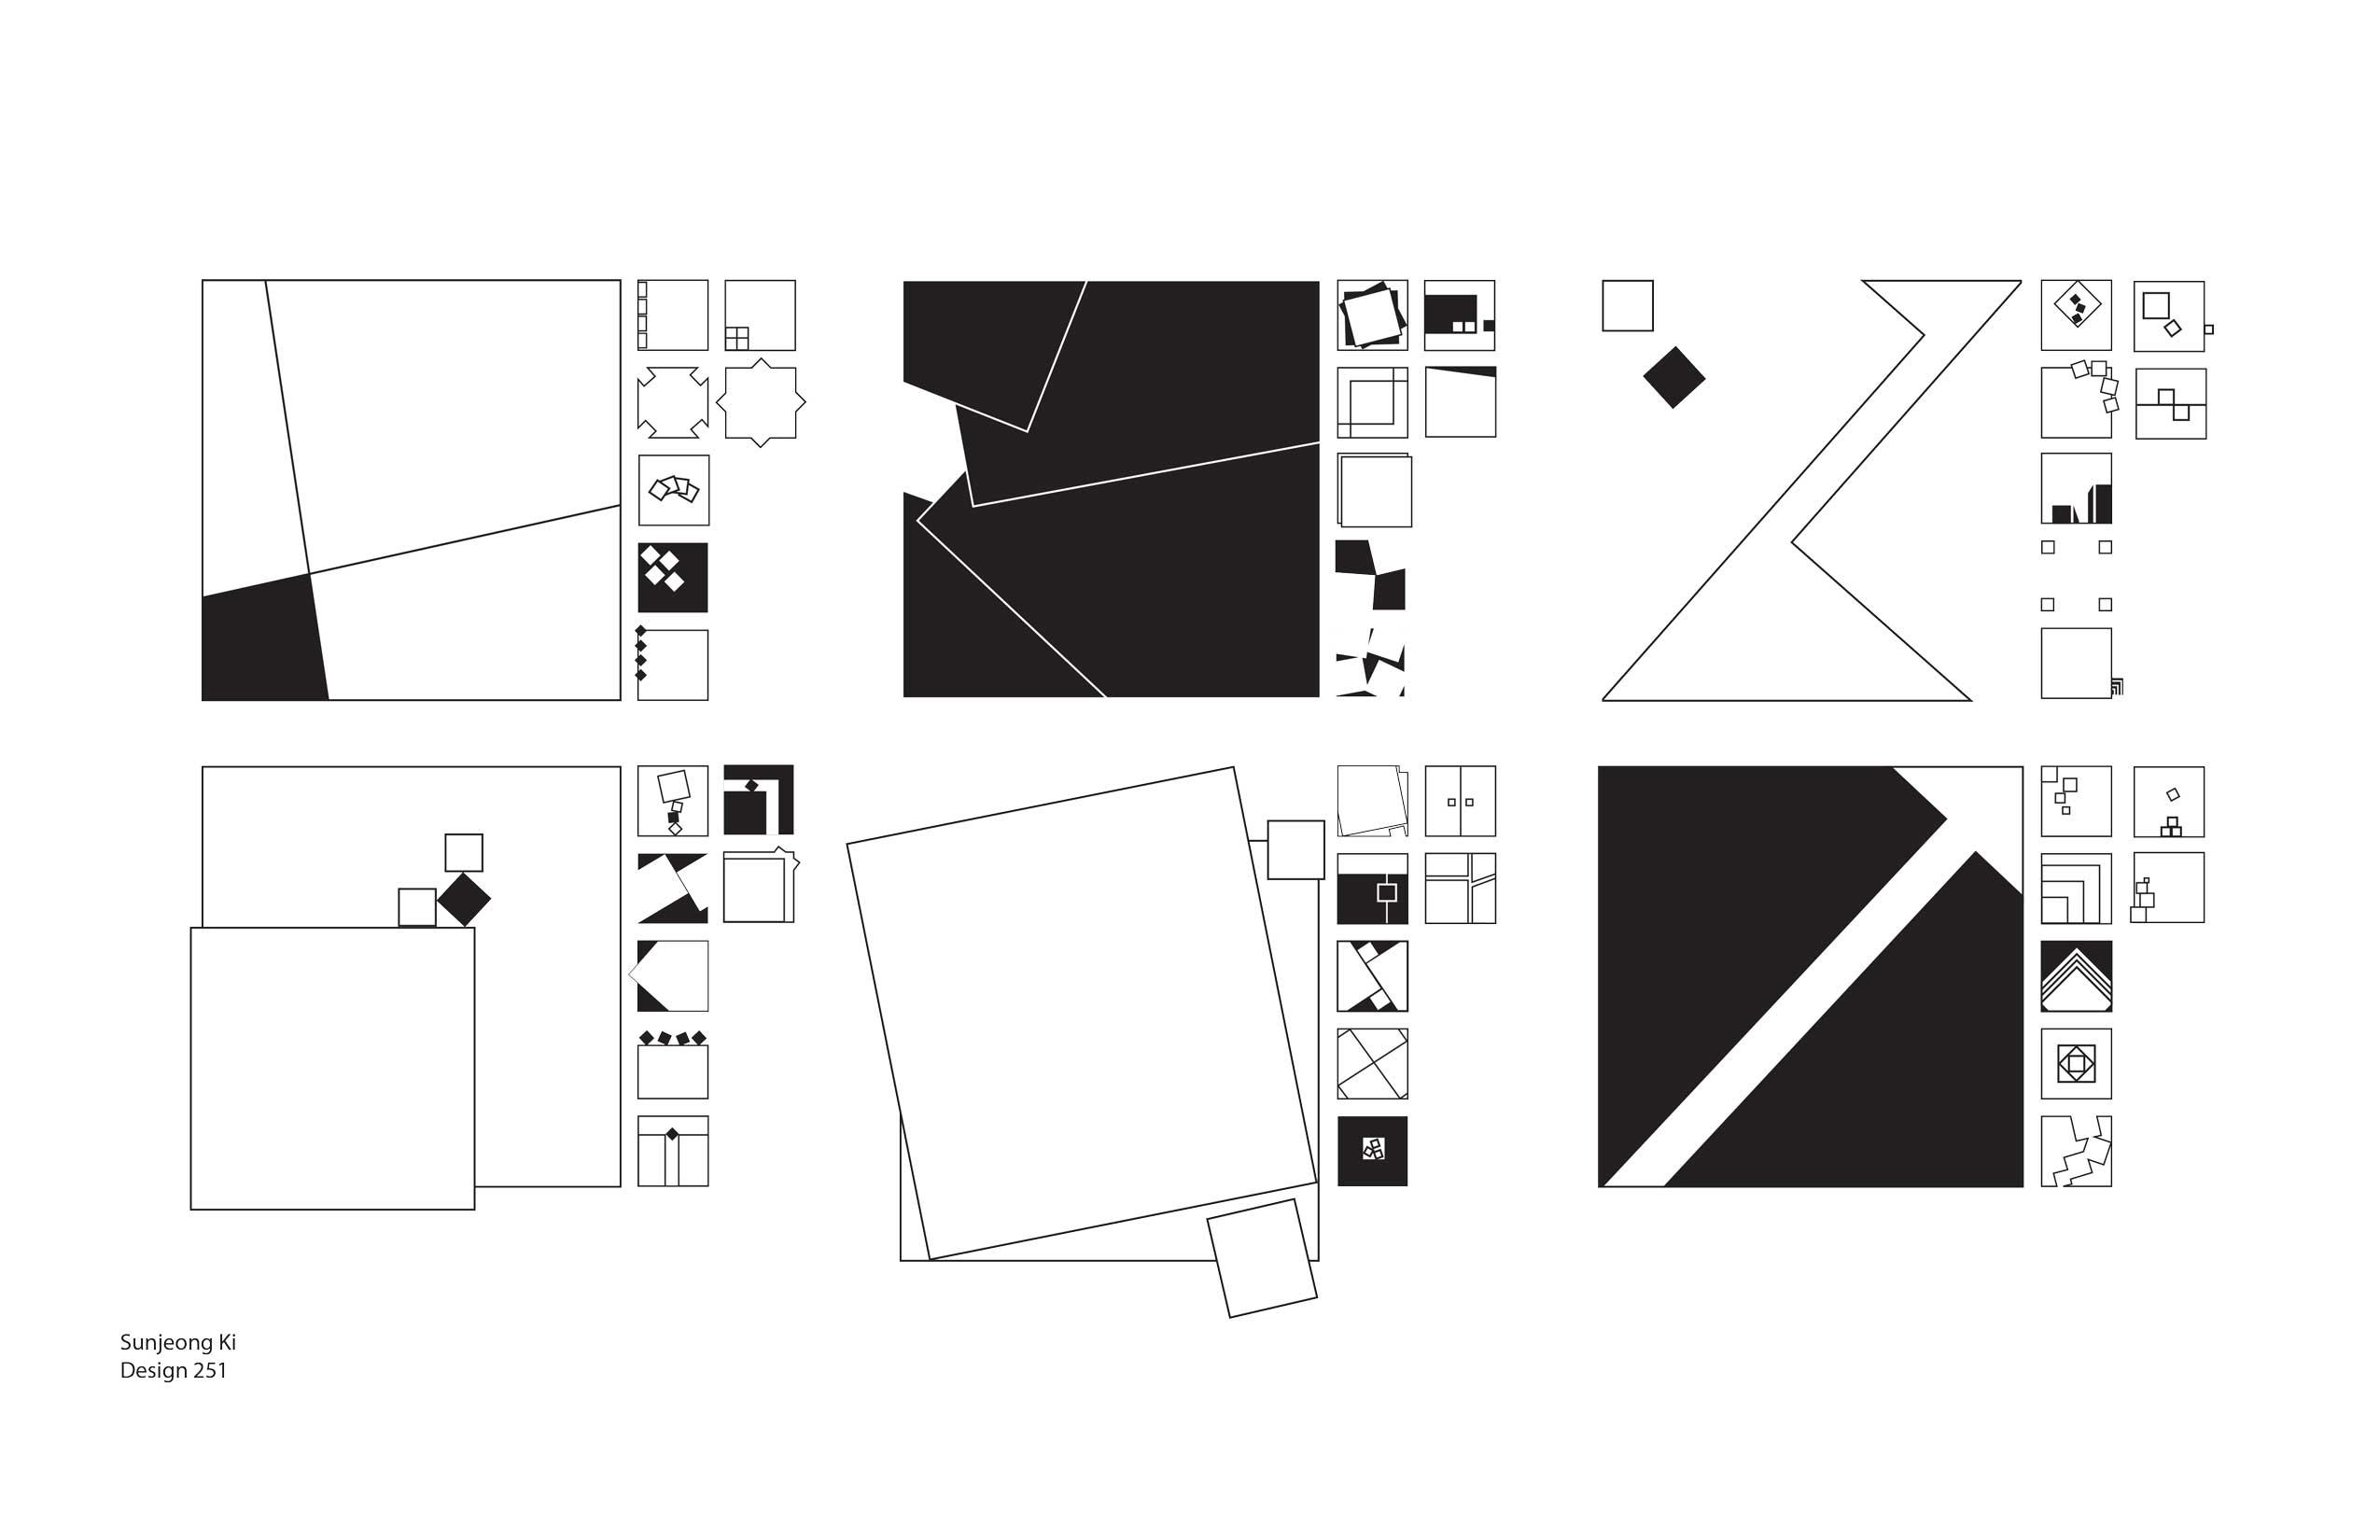 Principles Of Design Line : 2d design foundations andre mūrnieks